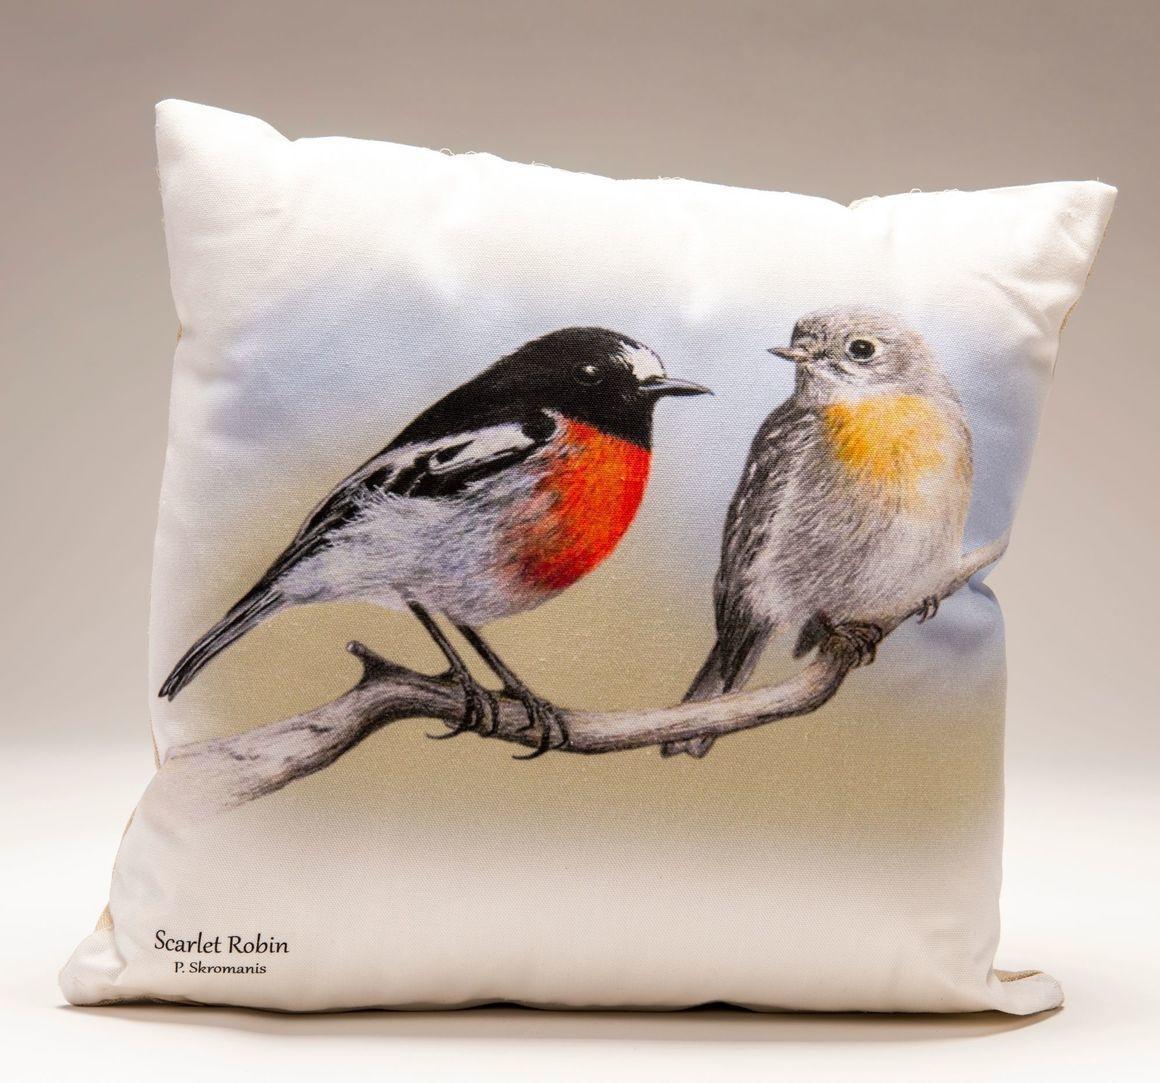 Cushion Covers - Scarlet Robin   Trada Marketplace